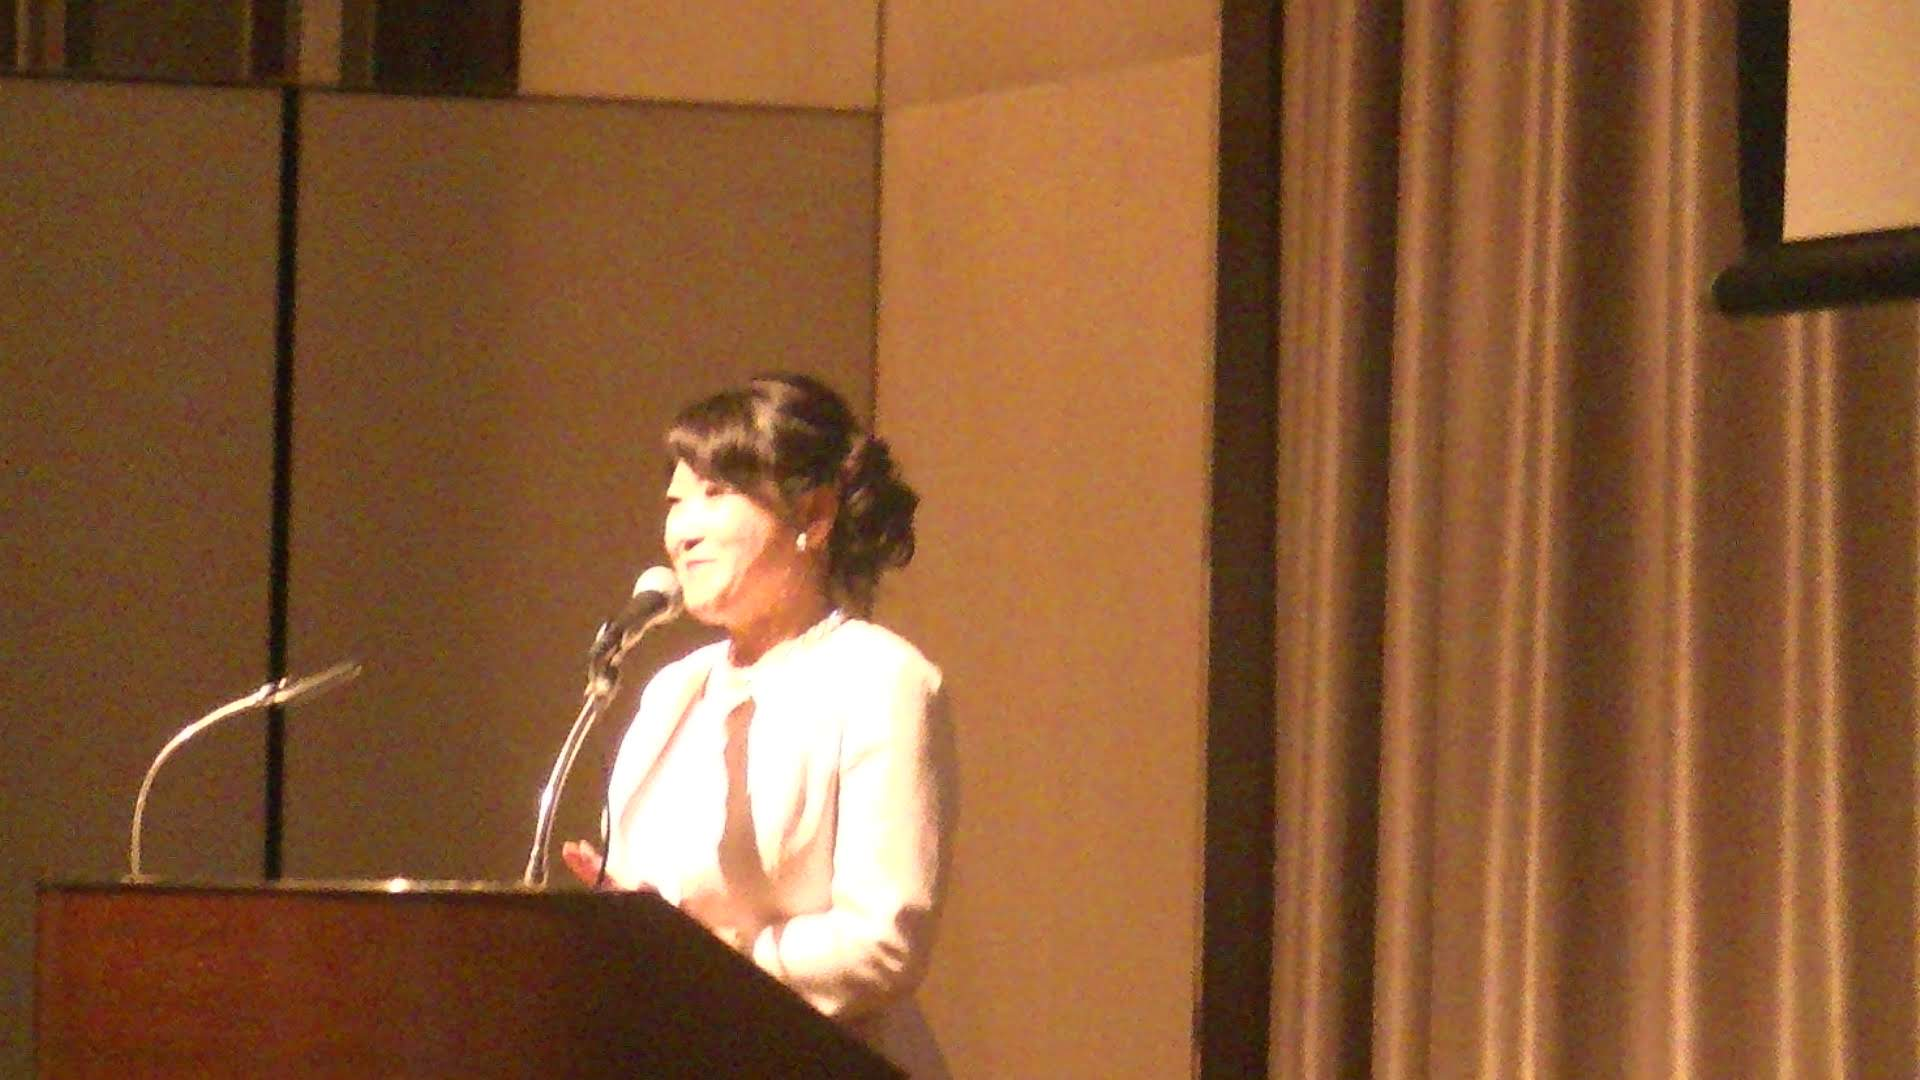 PIC 1764 1 - 思風会全国大会in広島